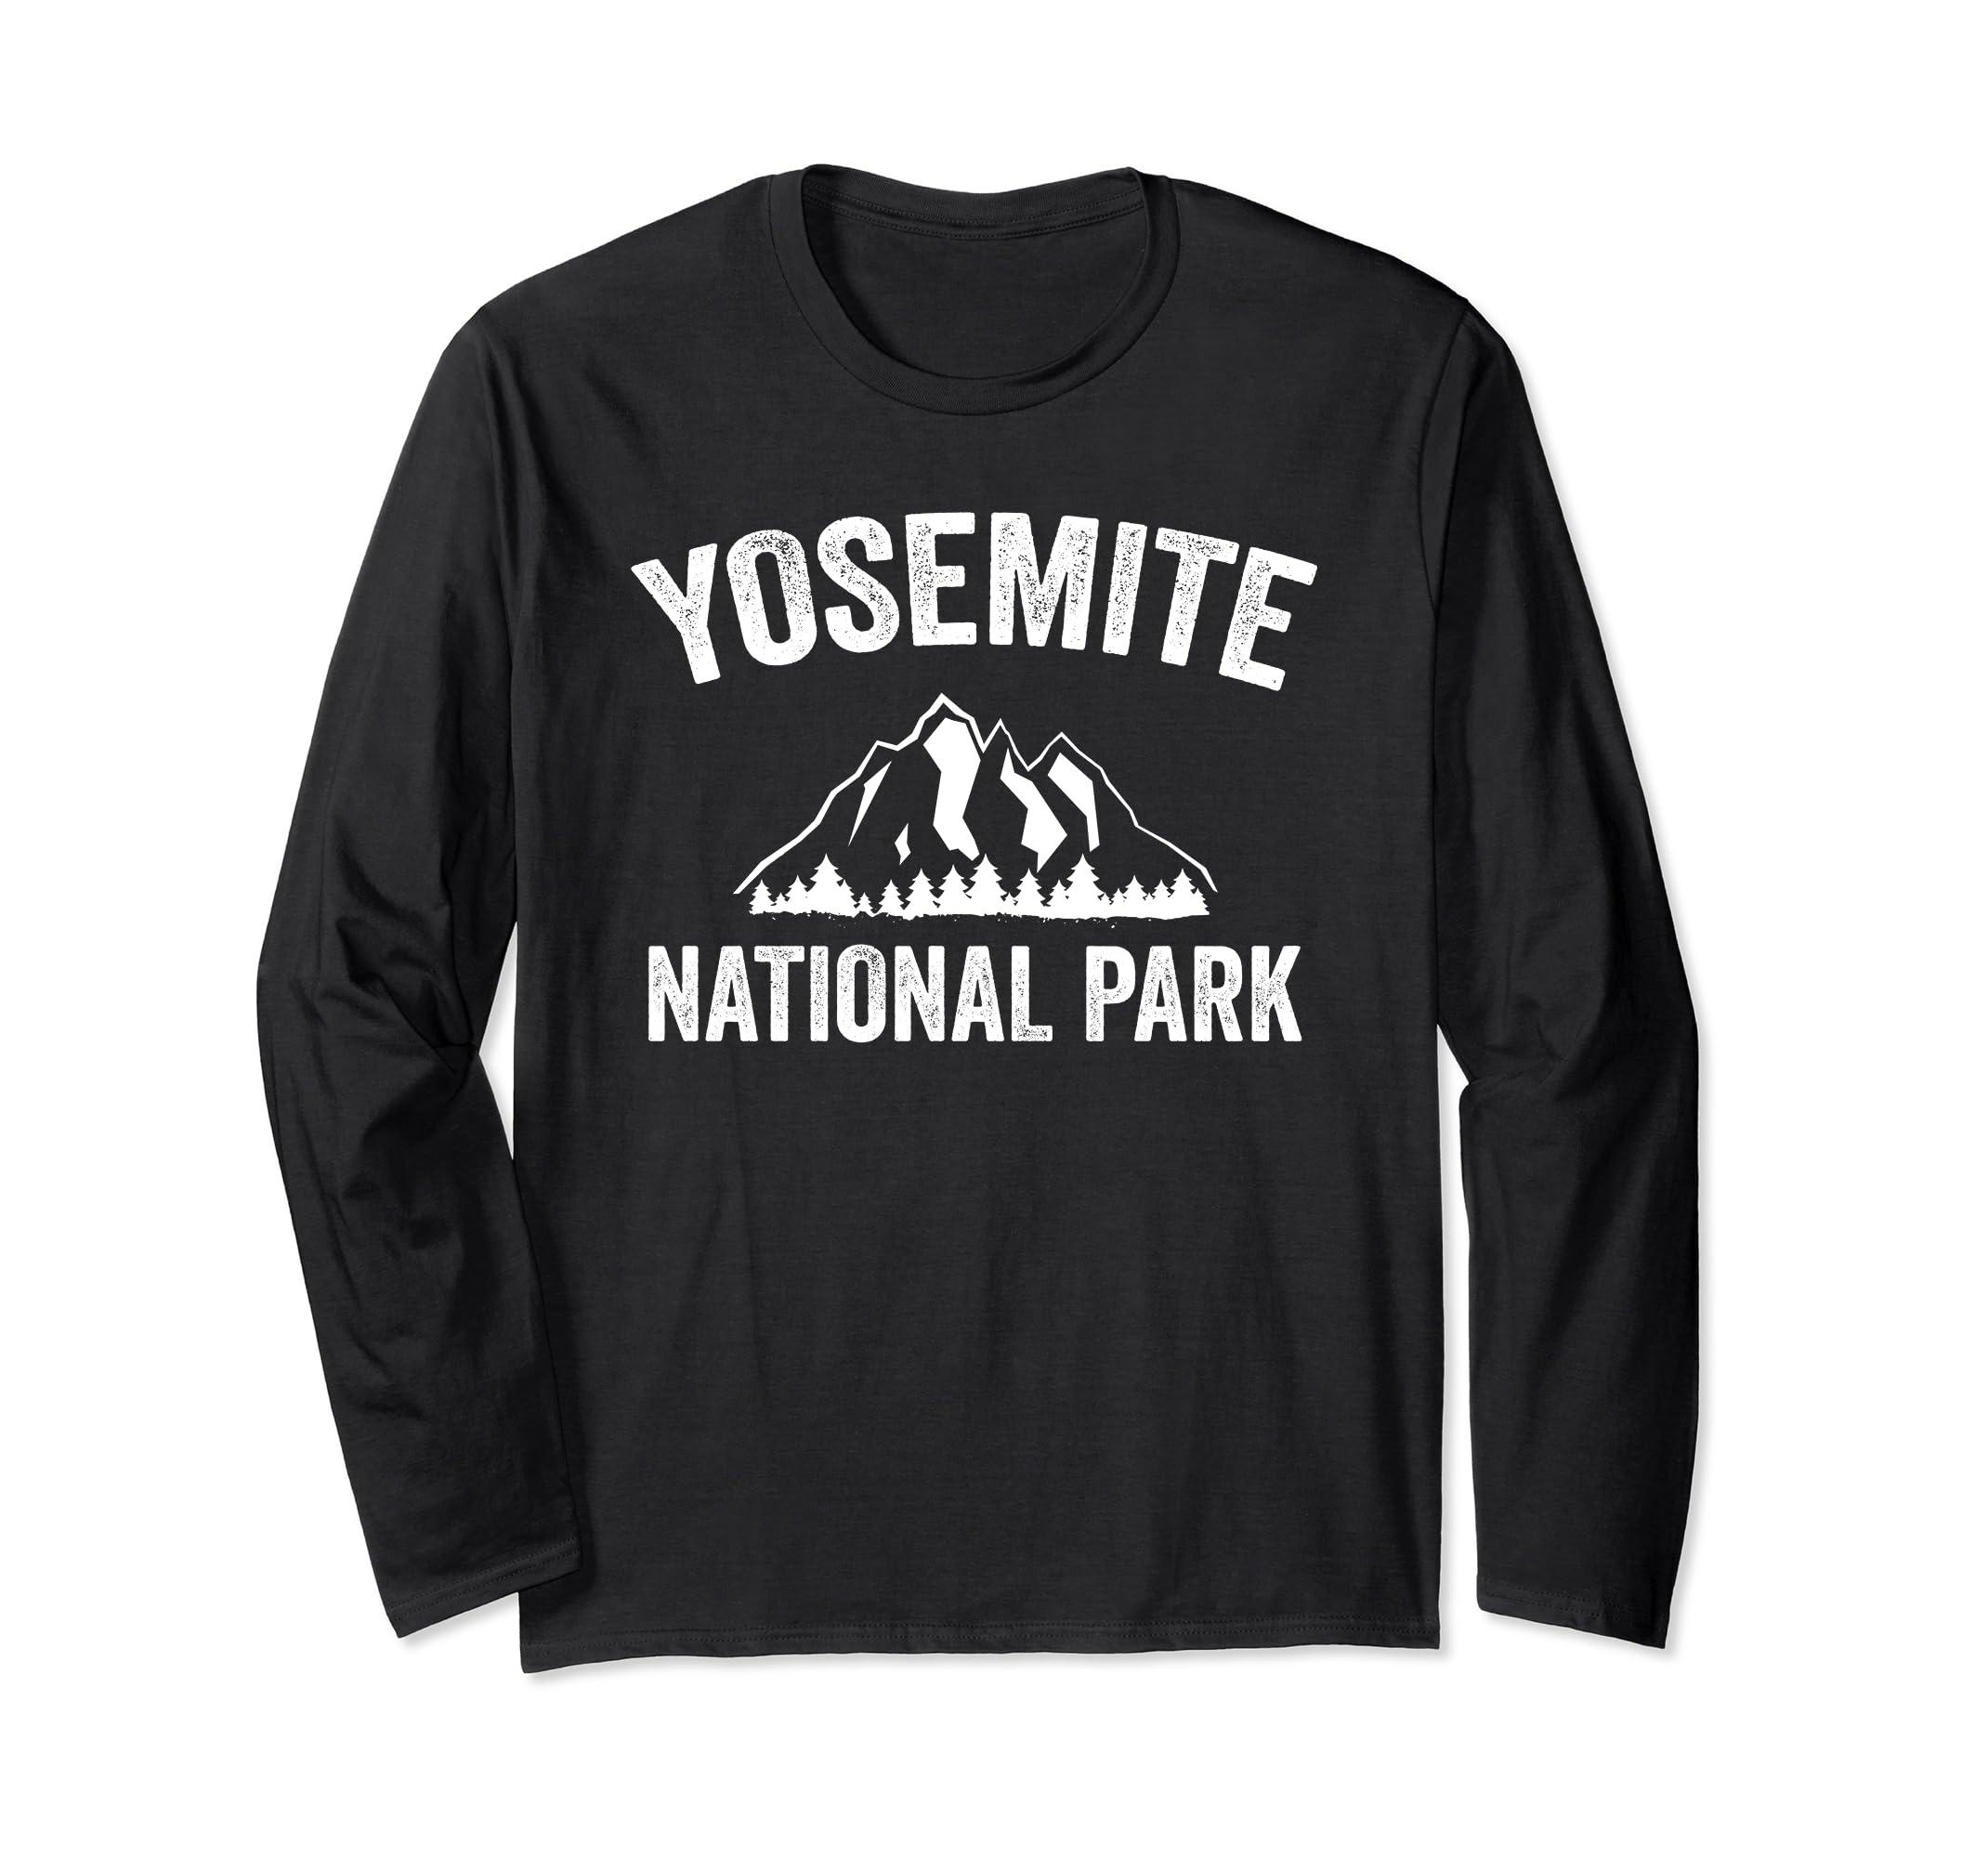 Yosemite National Park Long Sleeve Shirt America USA-Awarplus